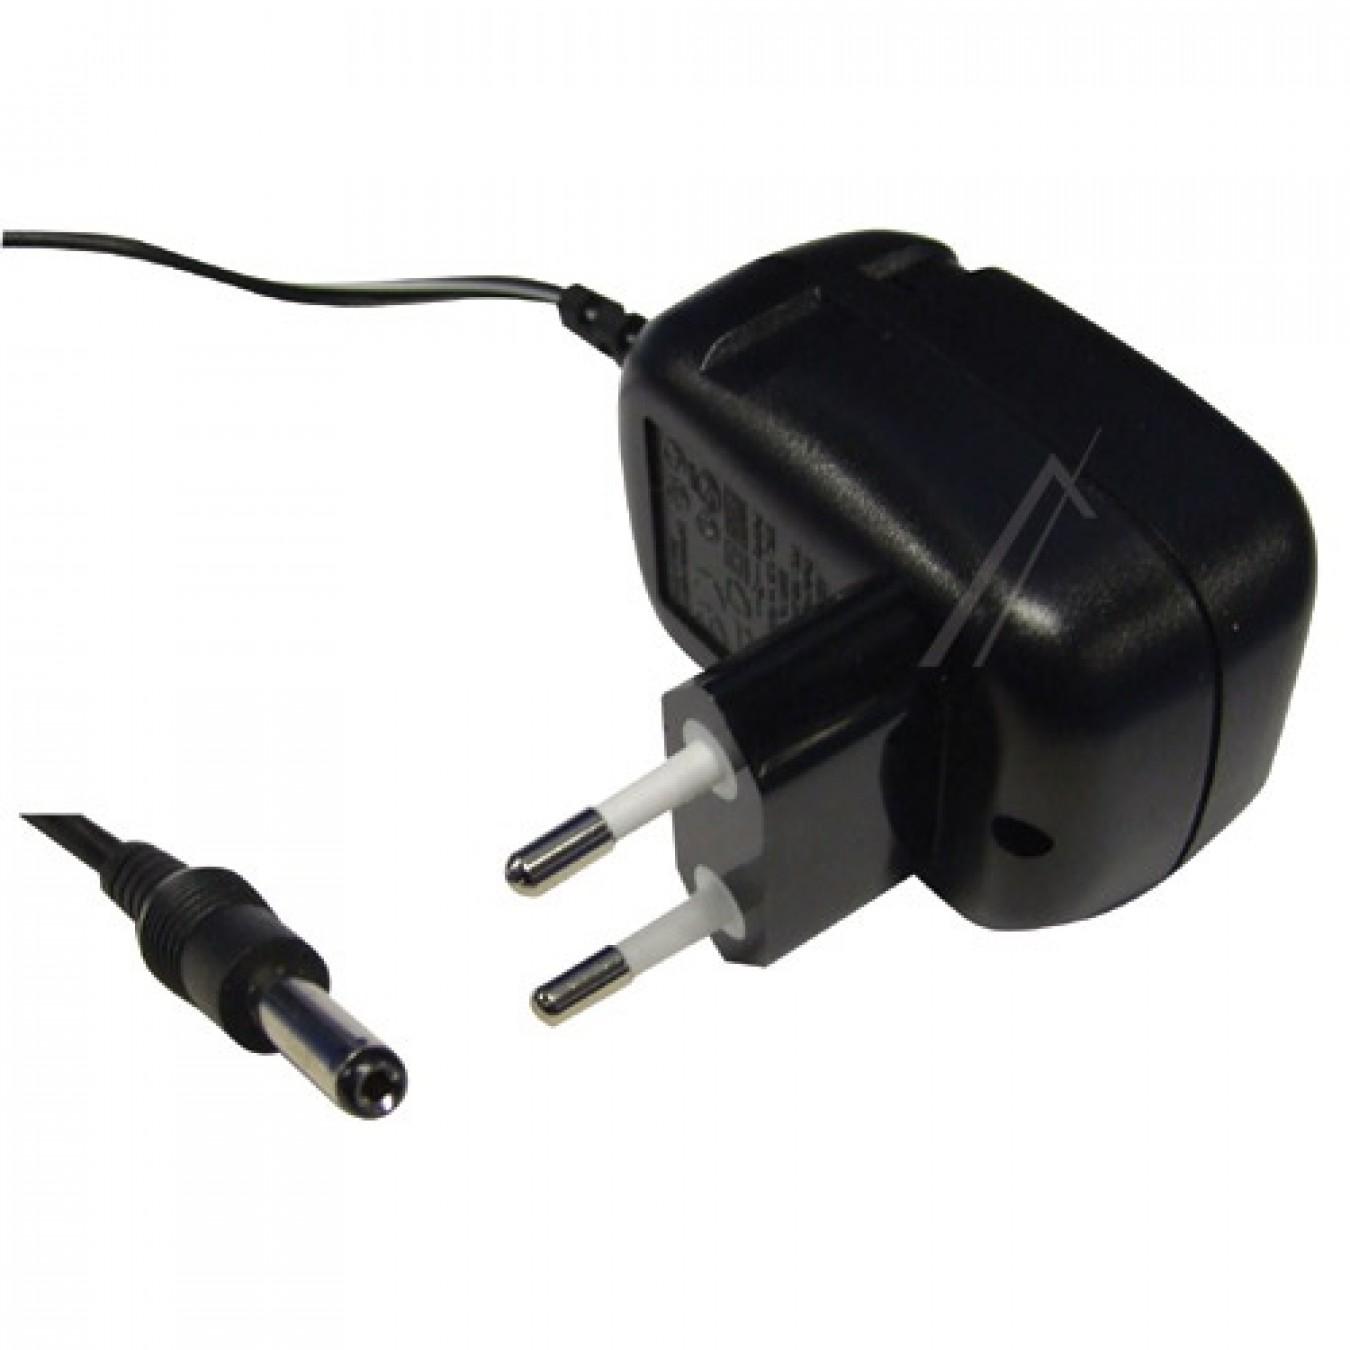 AC/DC Adapter CRP334/01 422203990471